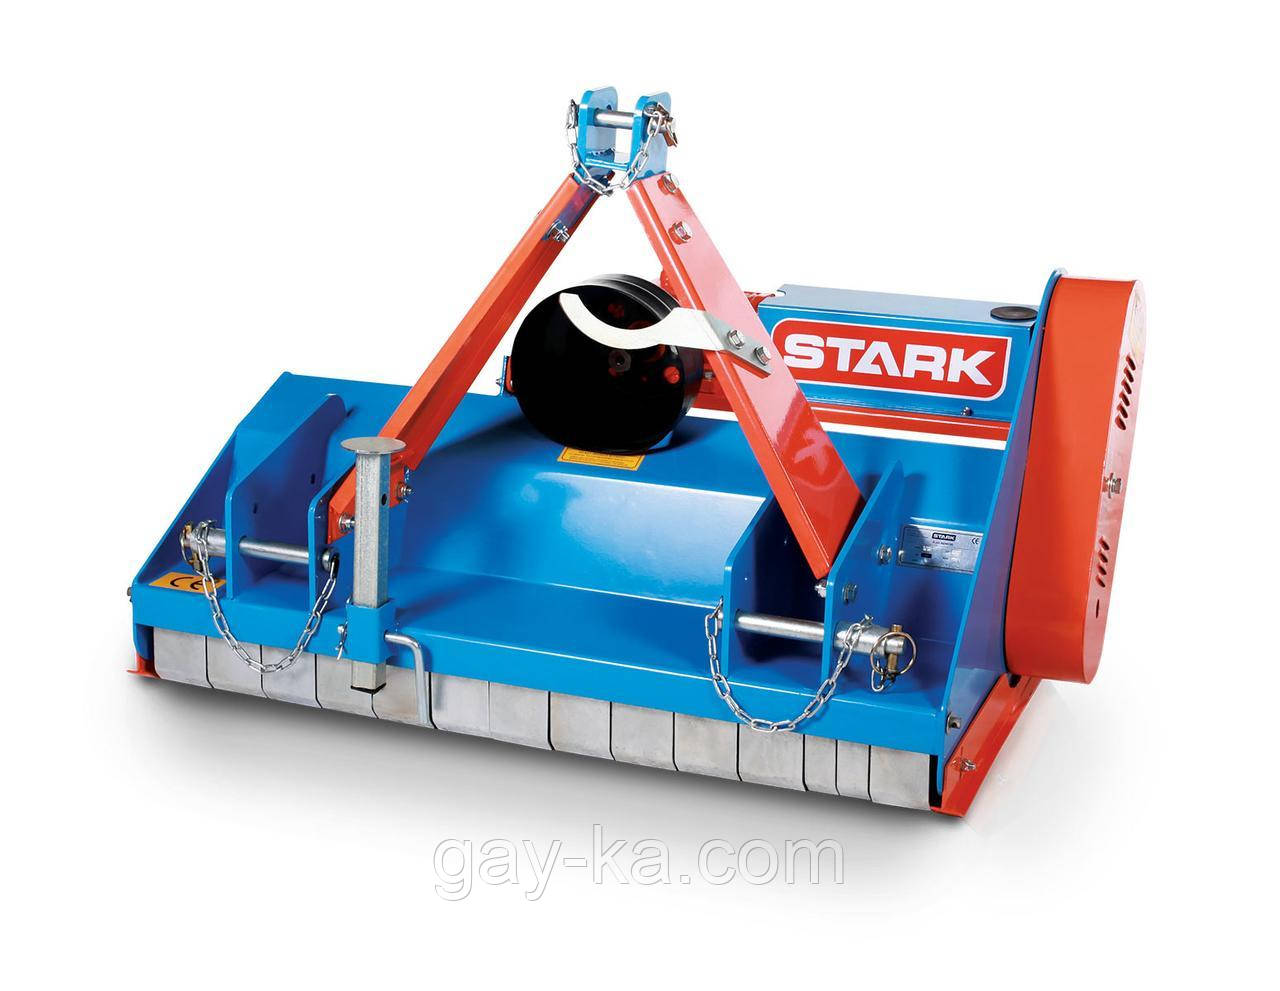 Мульчирователь KS 95 STARK (0,95 м, ножи) (Литва)